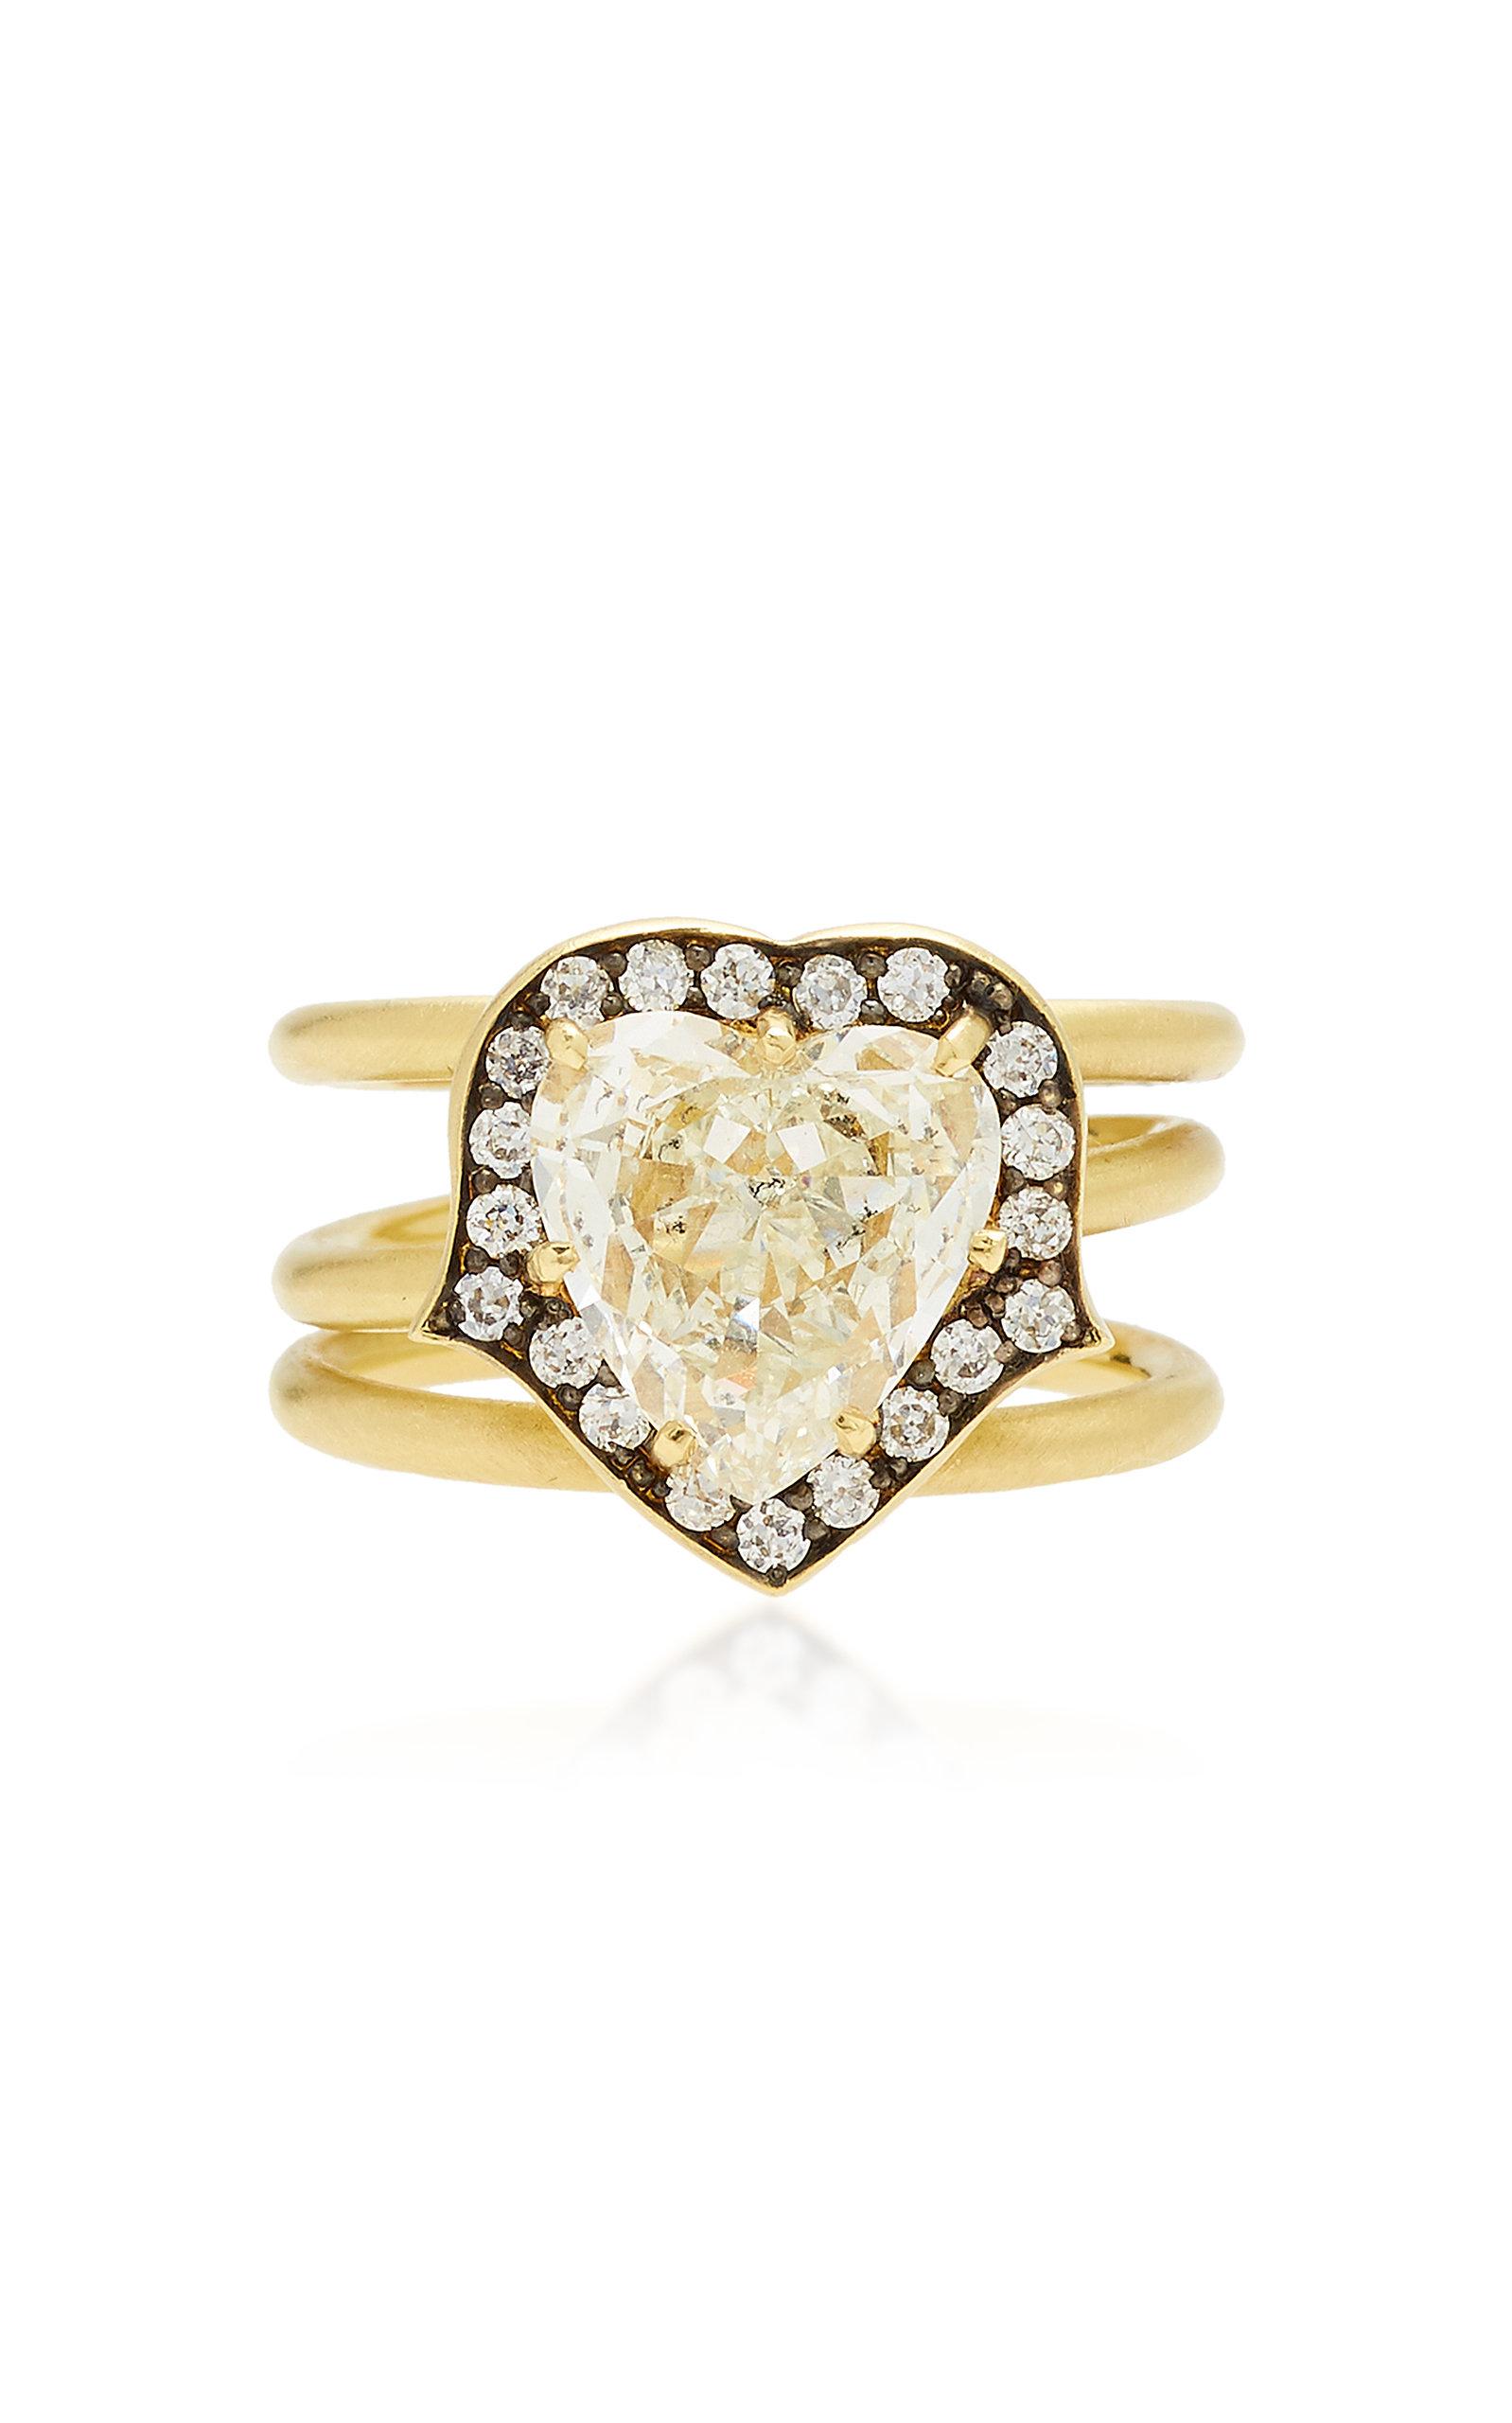 SYLVA & CIE 18K Gold Diamond Ring